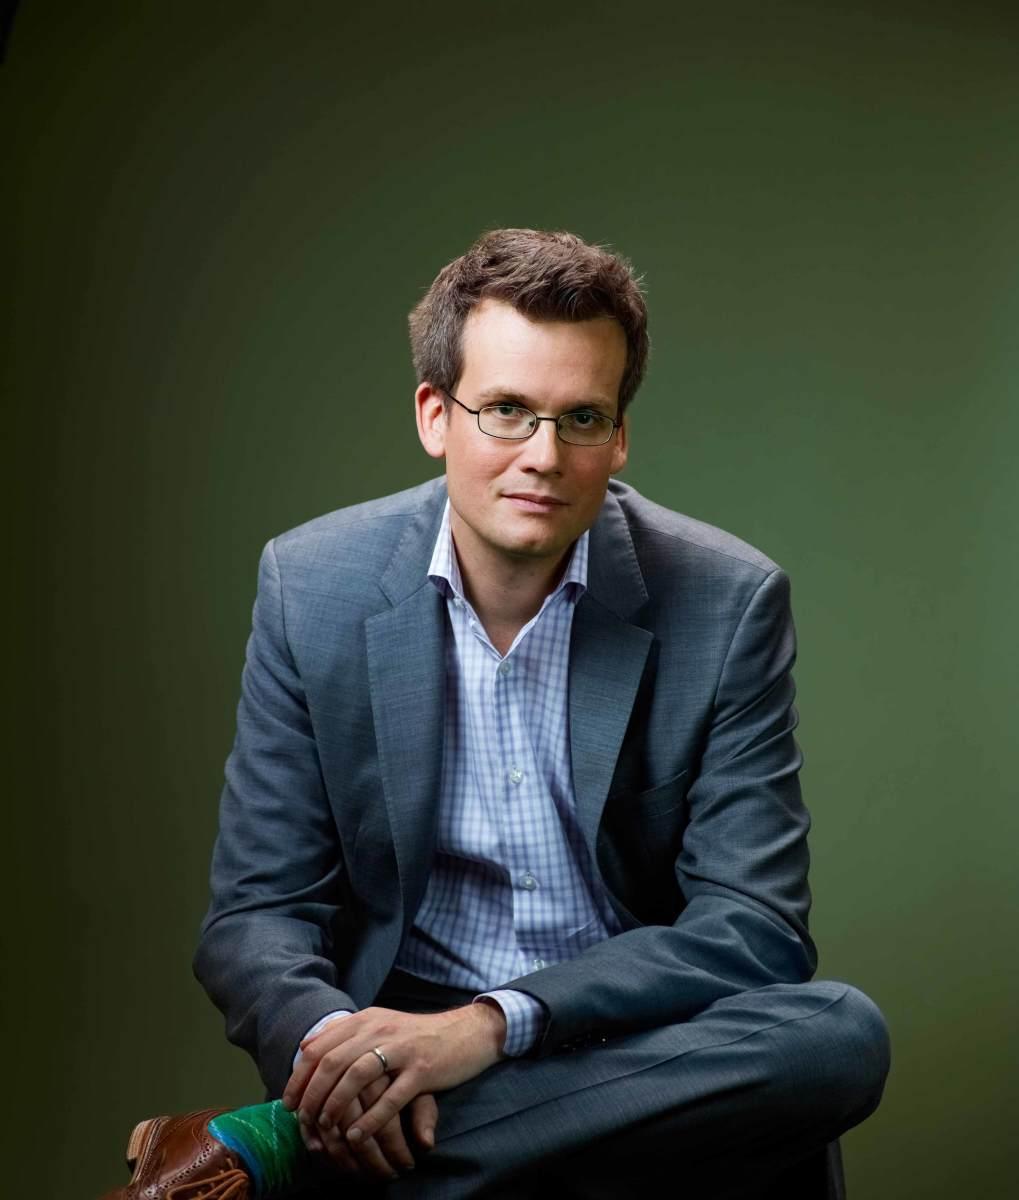 John Green, the book's author